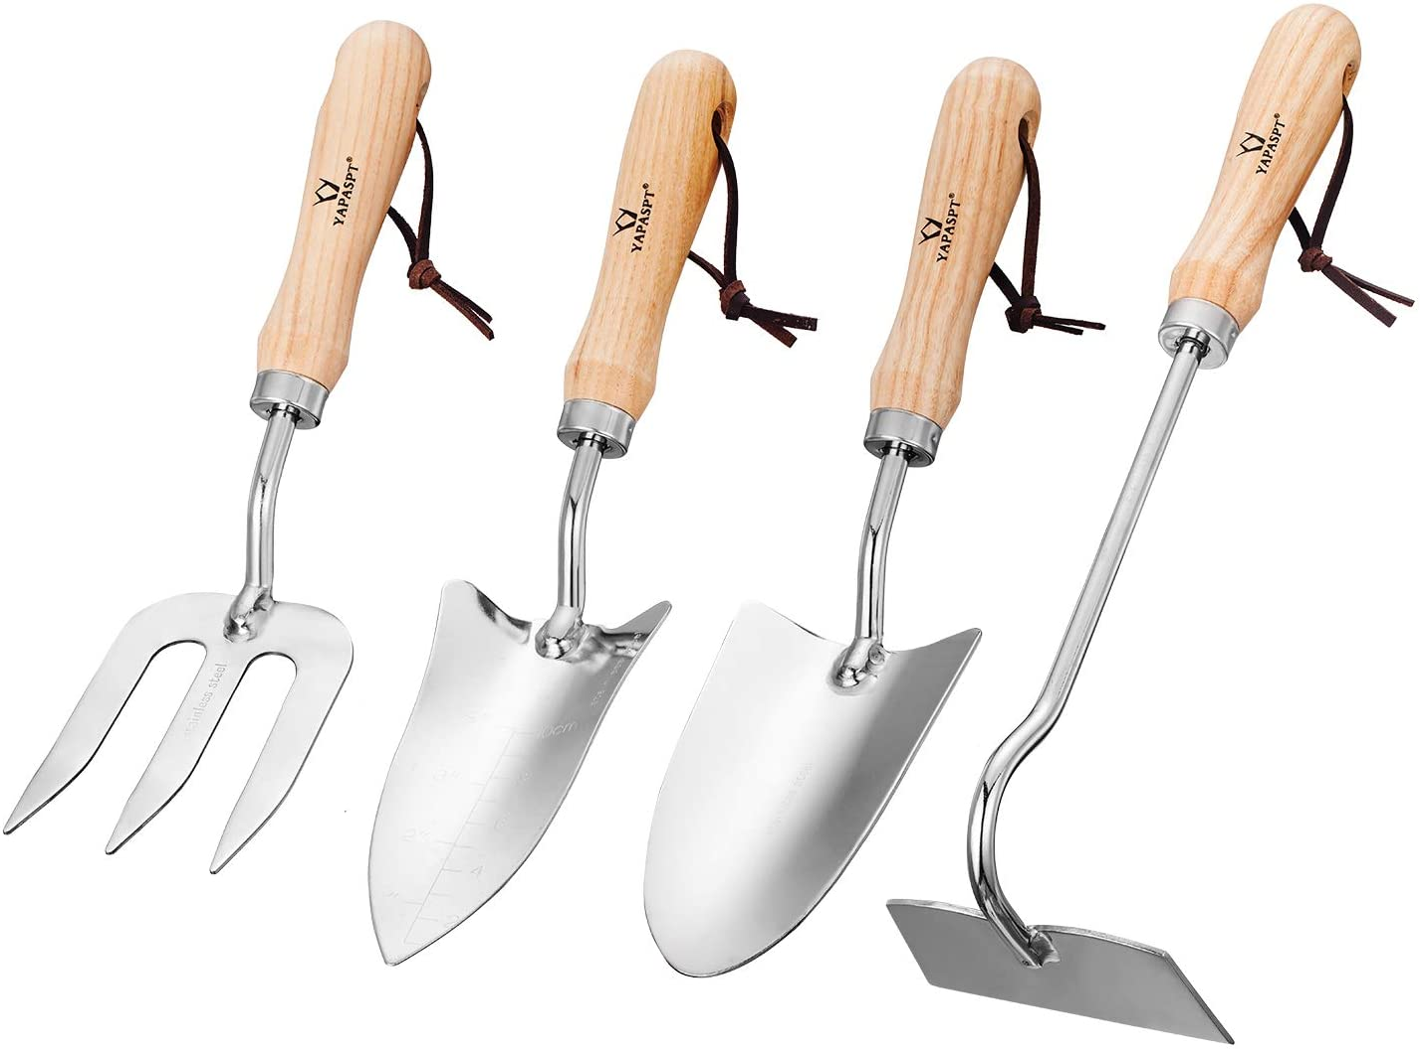 Garden Hand Tool Carbon Steel Set 3 Piece Transplanting Trowel Weed Fork Gift